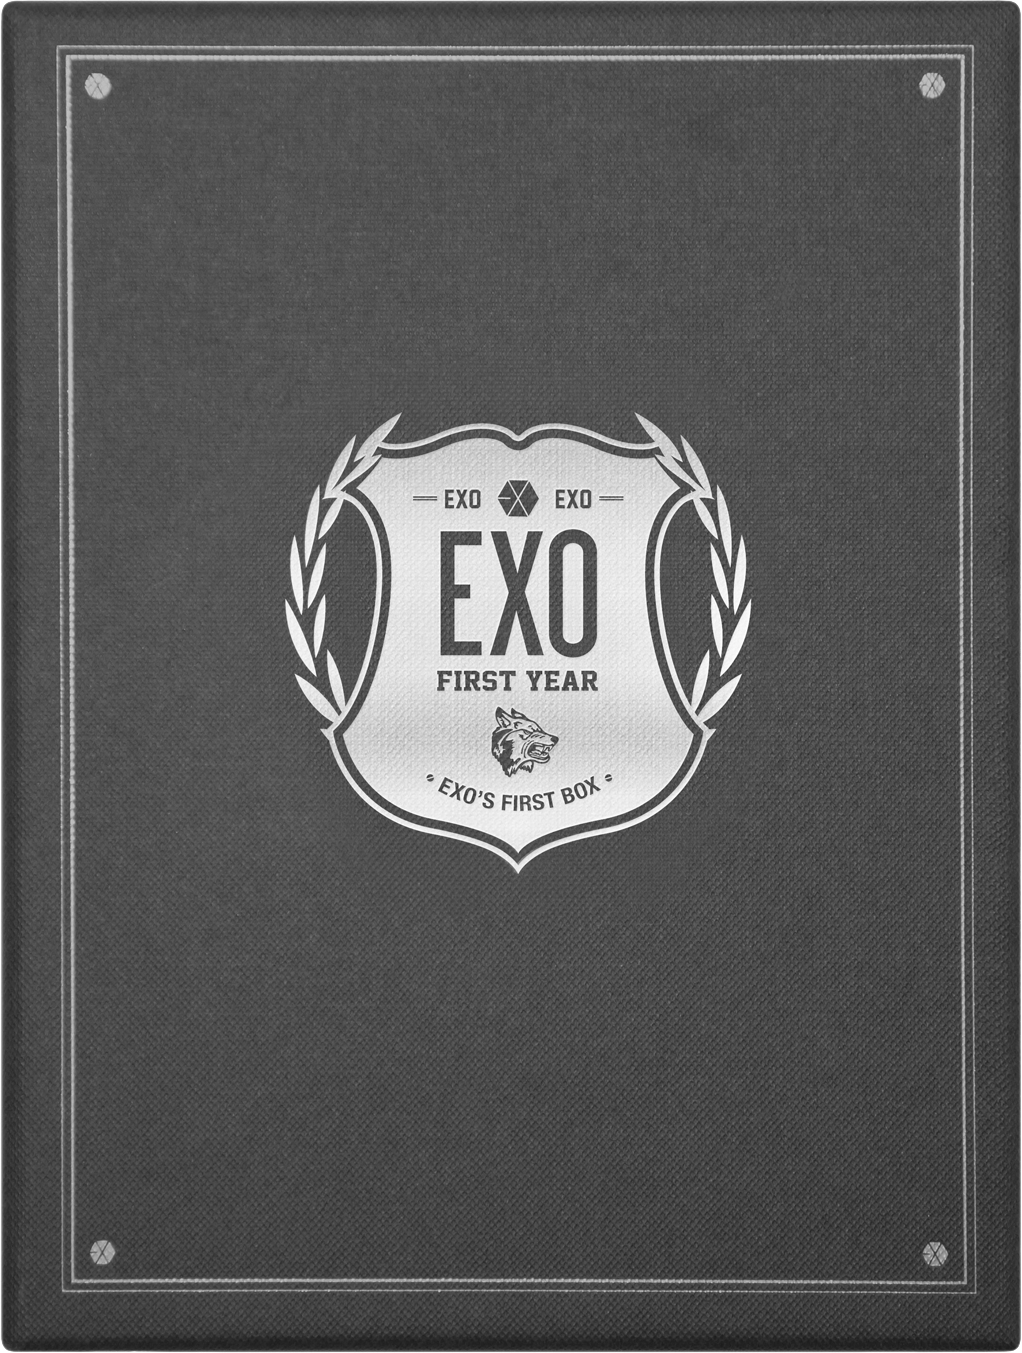 [DVD] EXO'S FIRST BOX